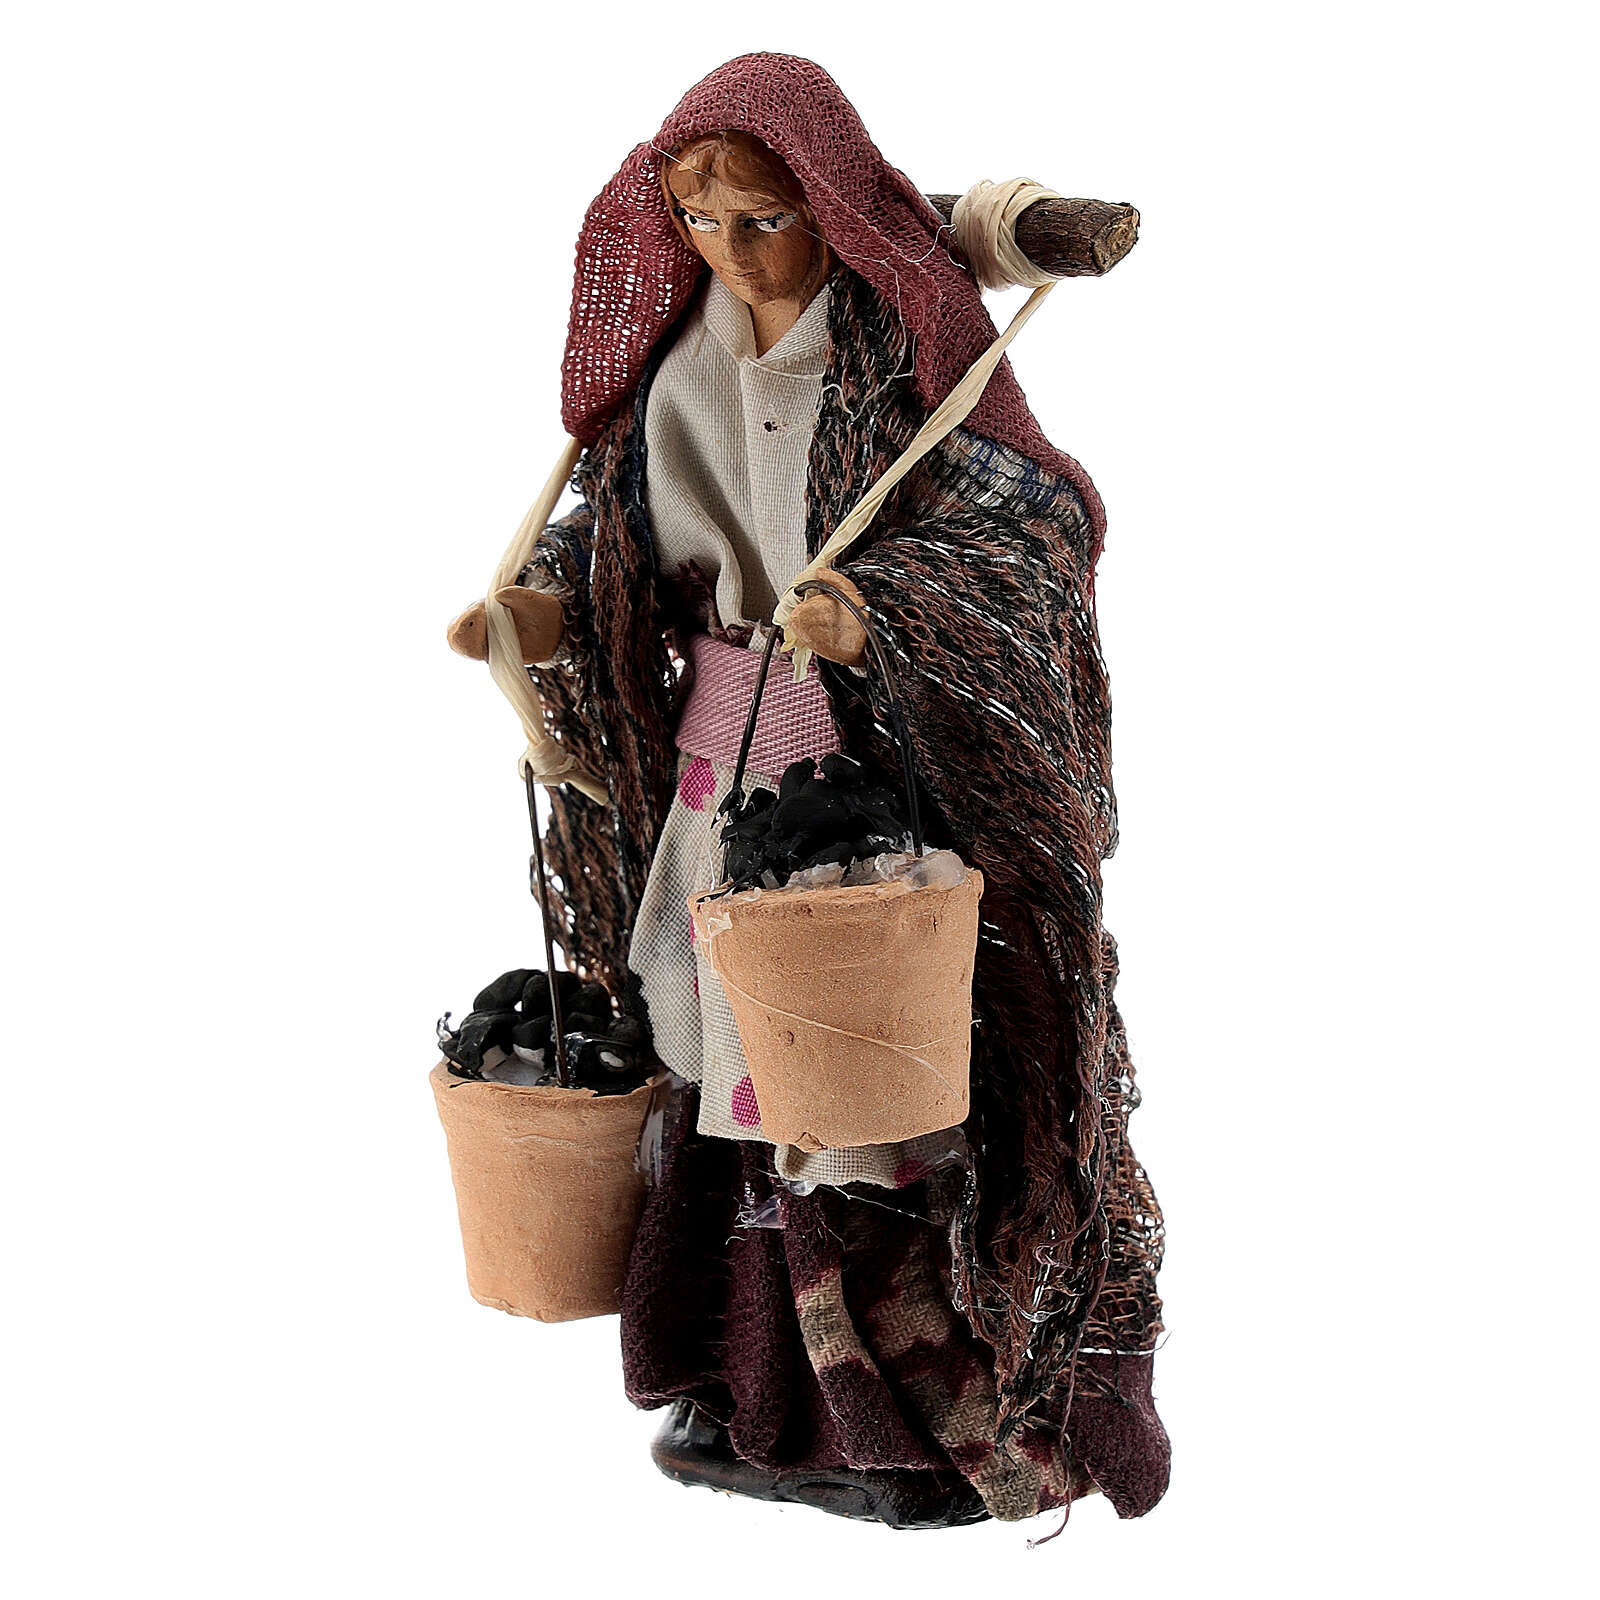 Woman with coal baskets terracotta, 8 cm Neapolitan nativity 4